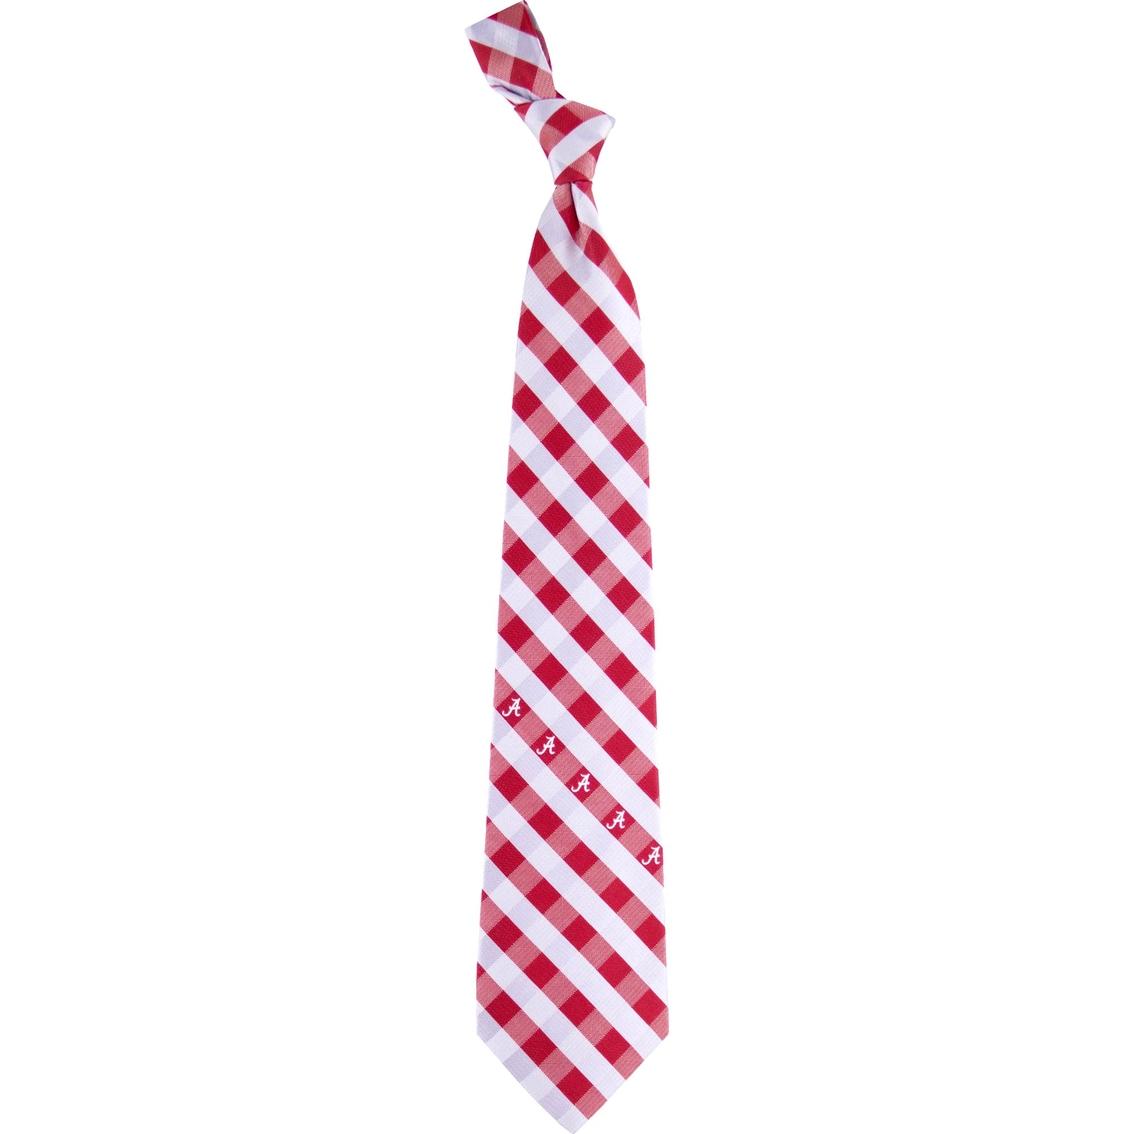 Eagles Wings Ncaa Alabama Crimson Tide Woven Check Tie